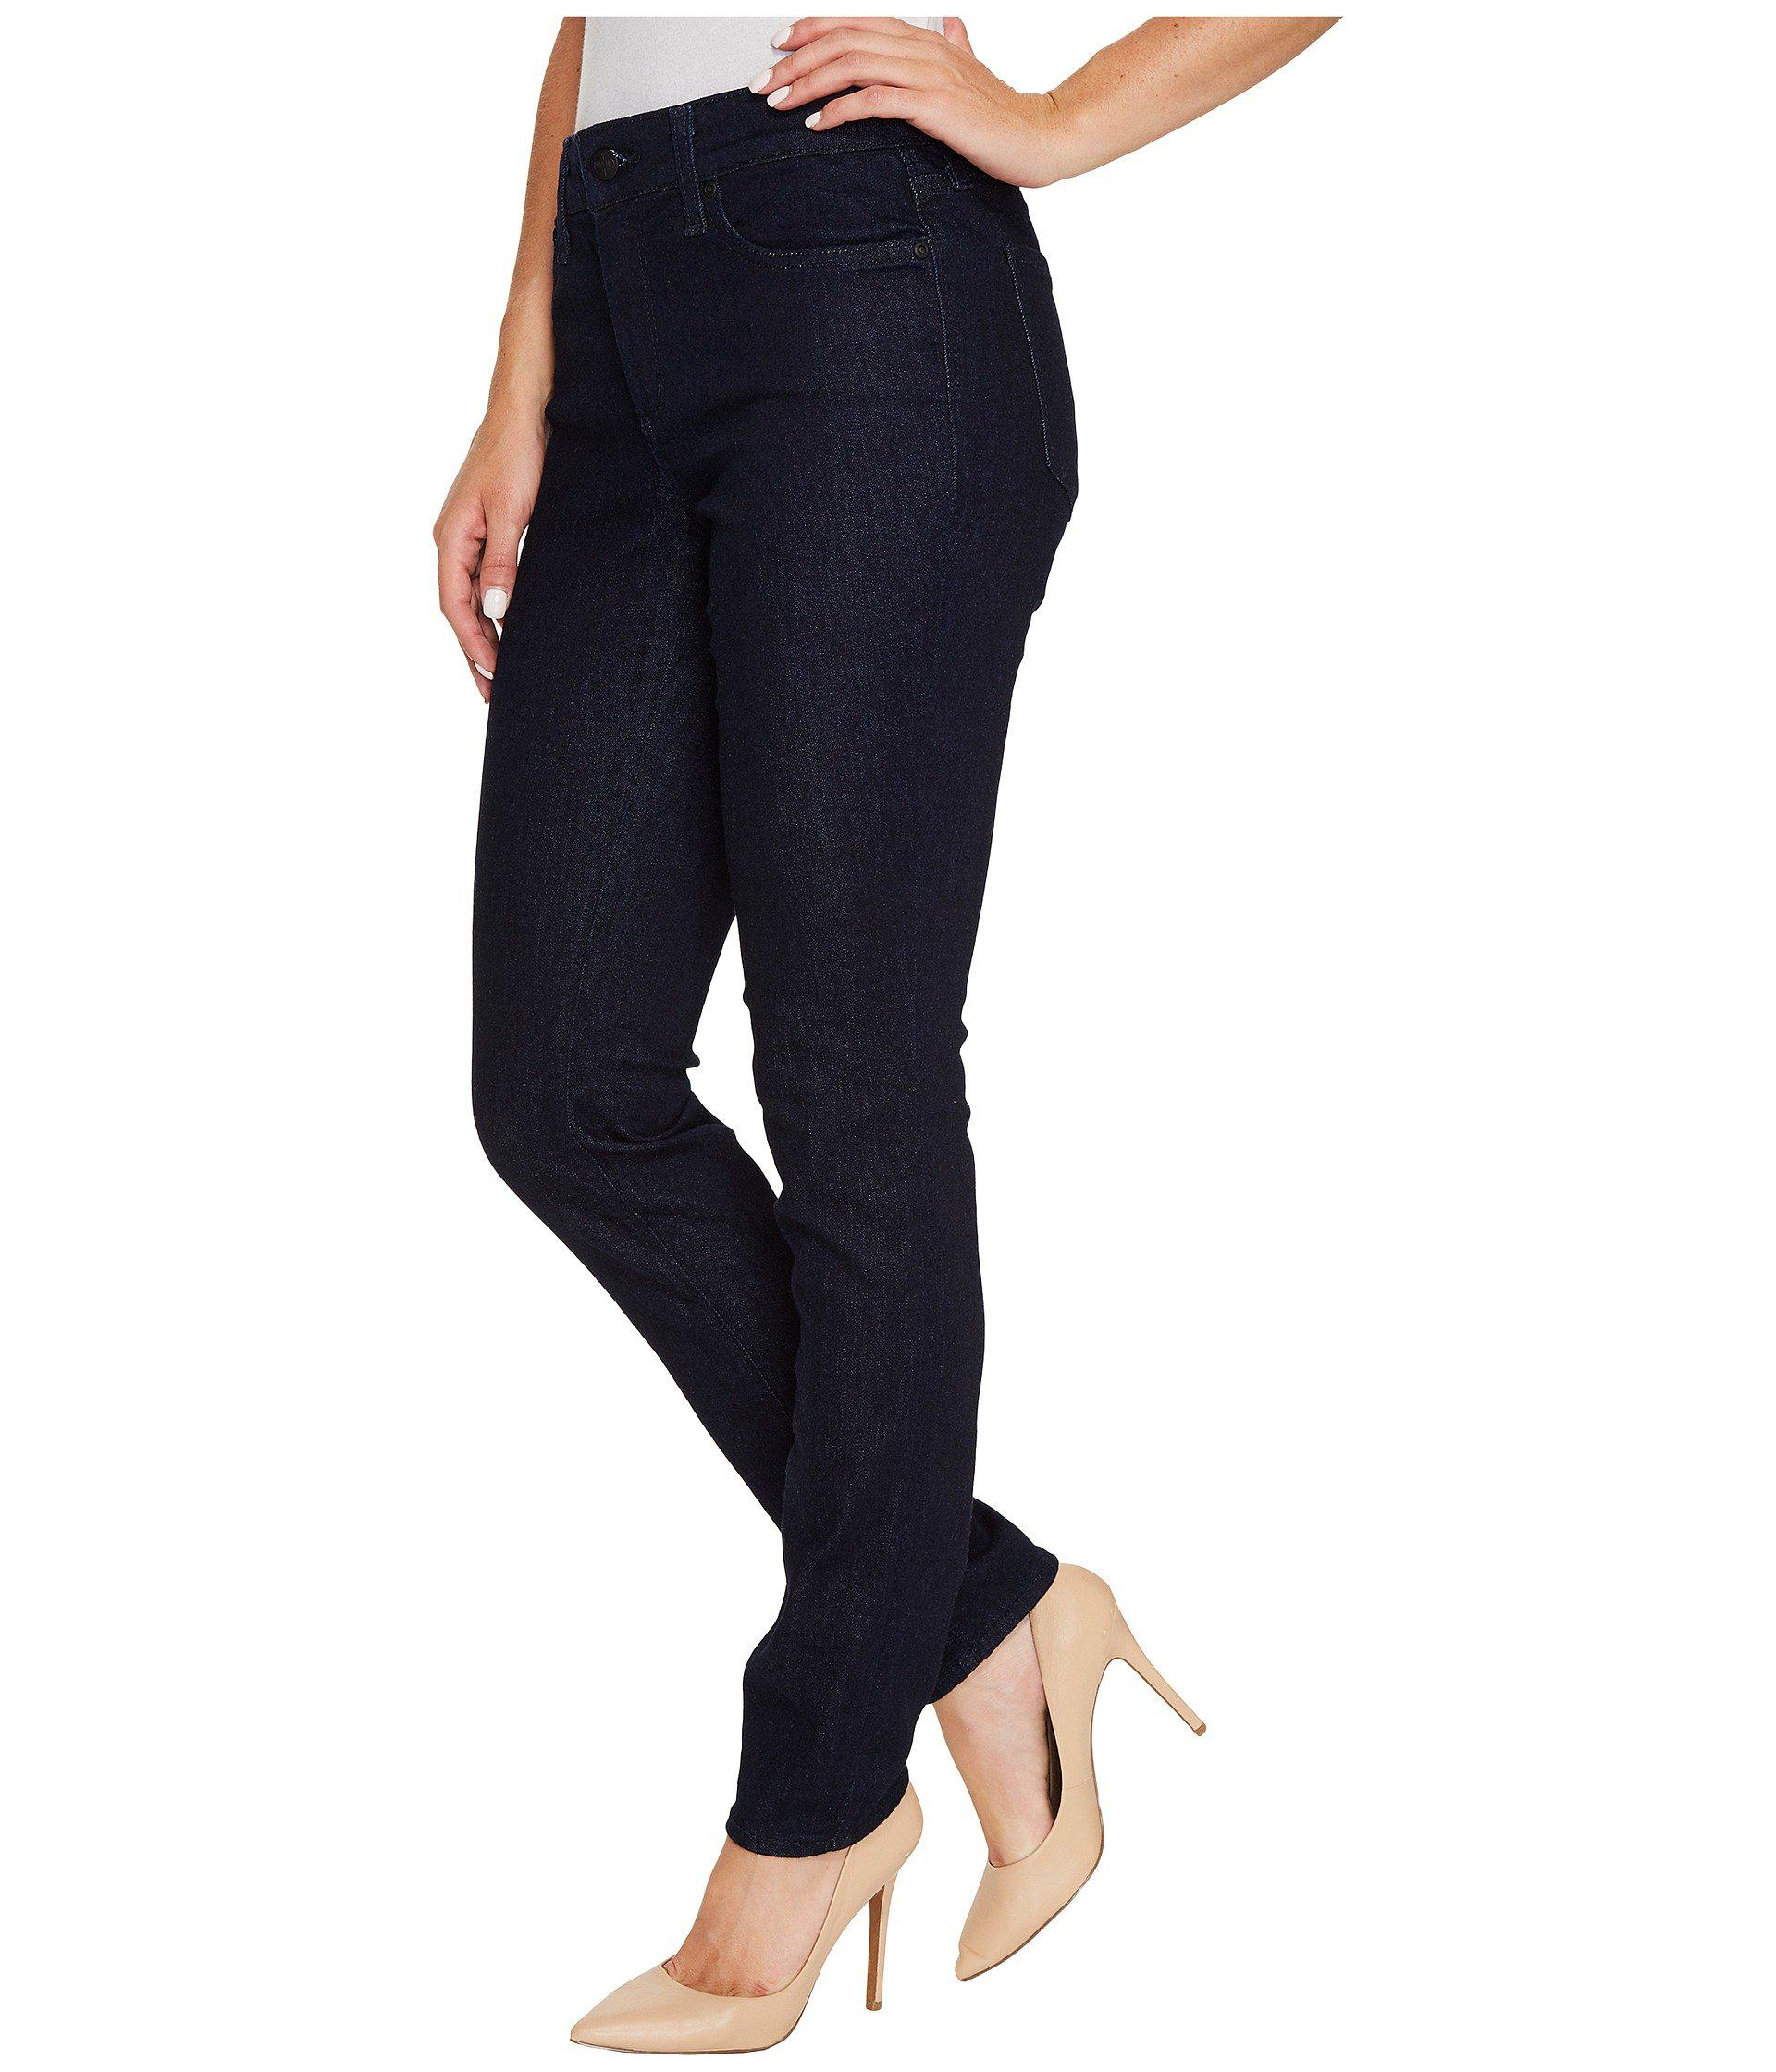 577116feac5b8 Lyst - NYDJ Ami Skinny Legging Jeans In Rinse (rinse) Women's Jeans in Blue  - Save 9%